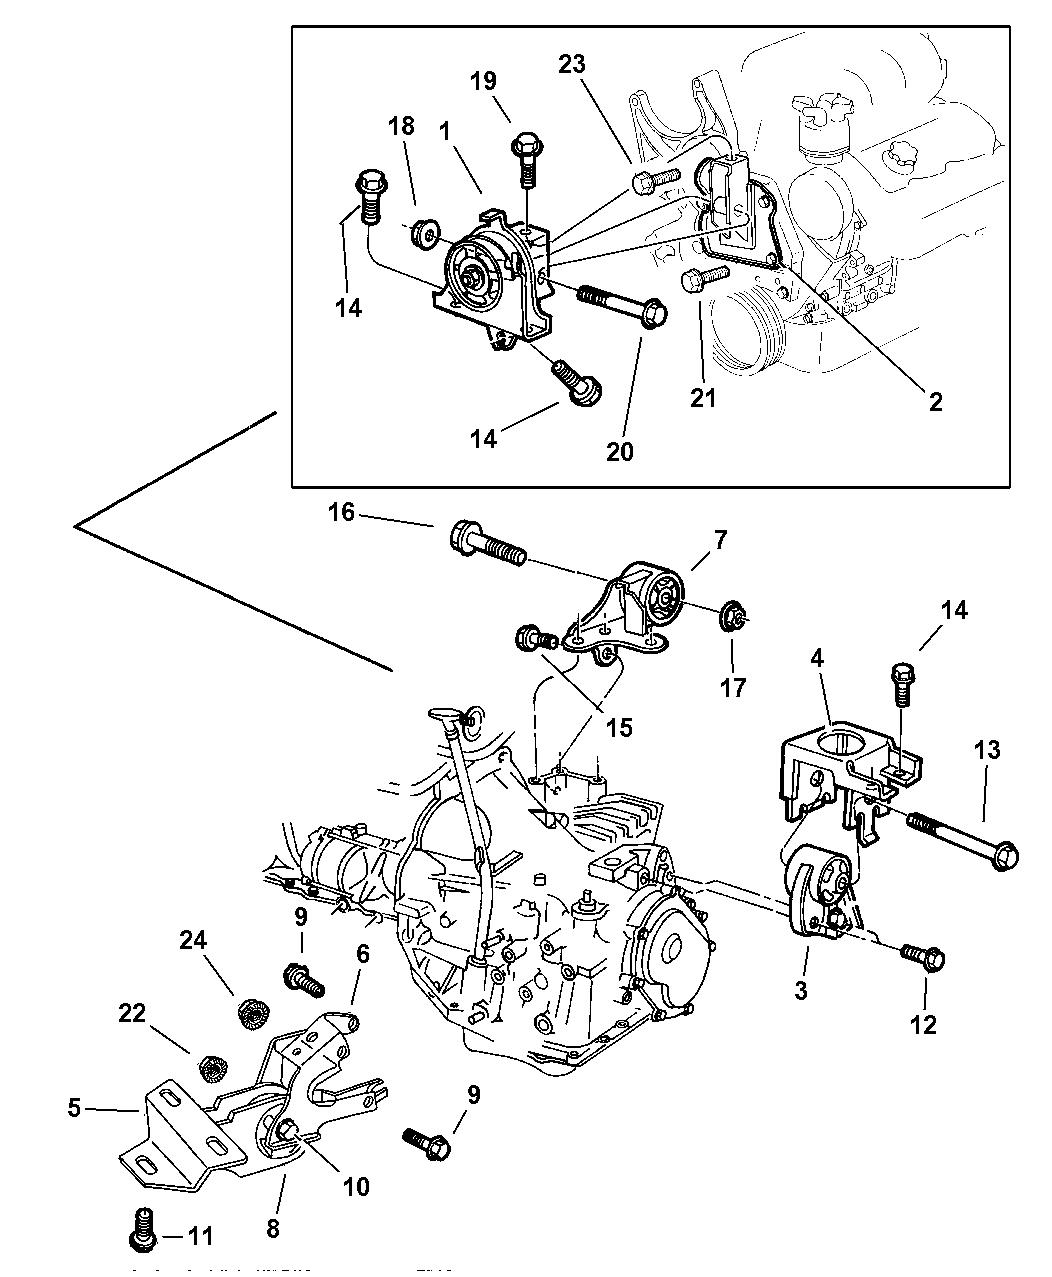 1997 Dodge Caravan Engine Mounts - Thumbnail 2